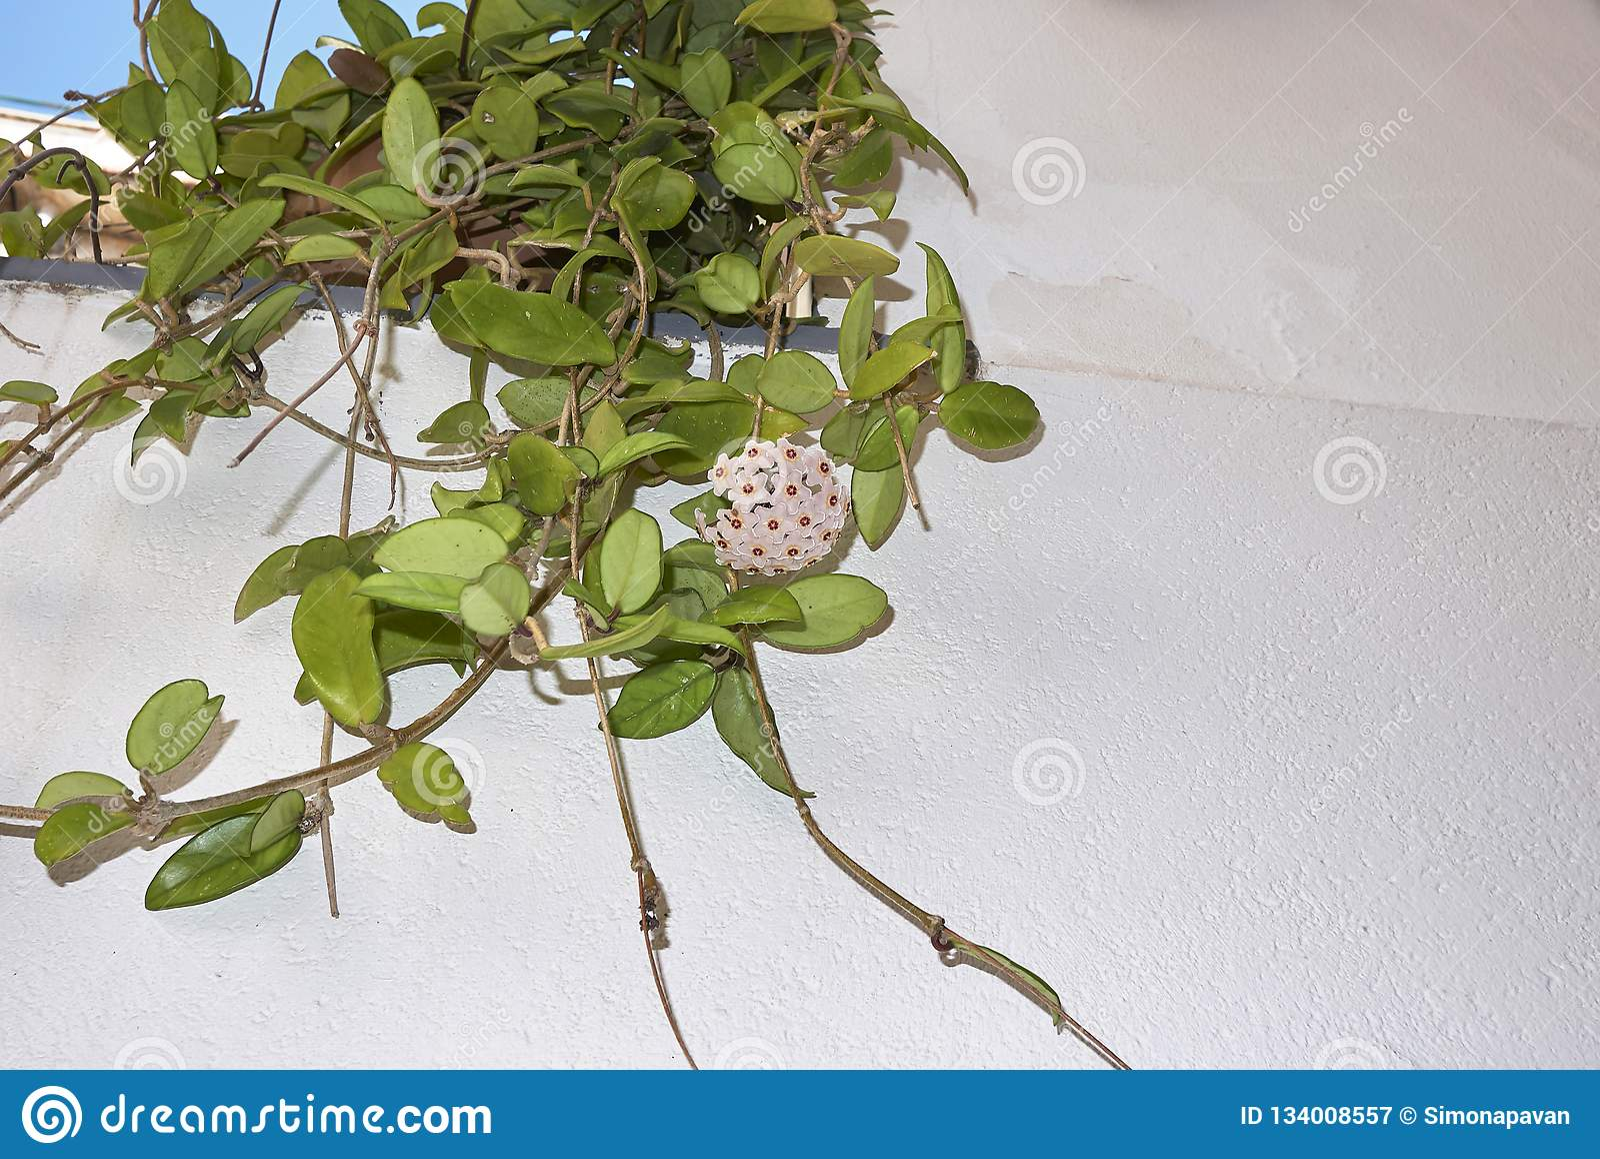 Hoya-carnosa in der Blüte